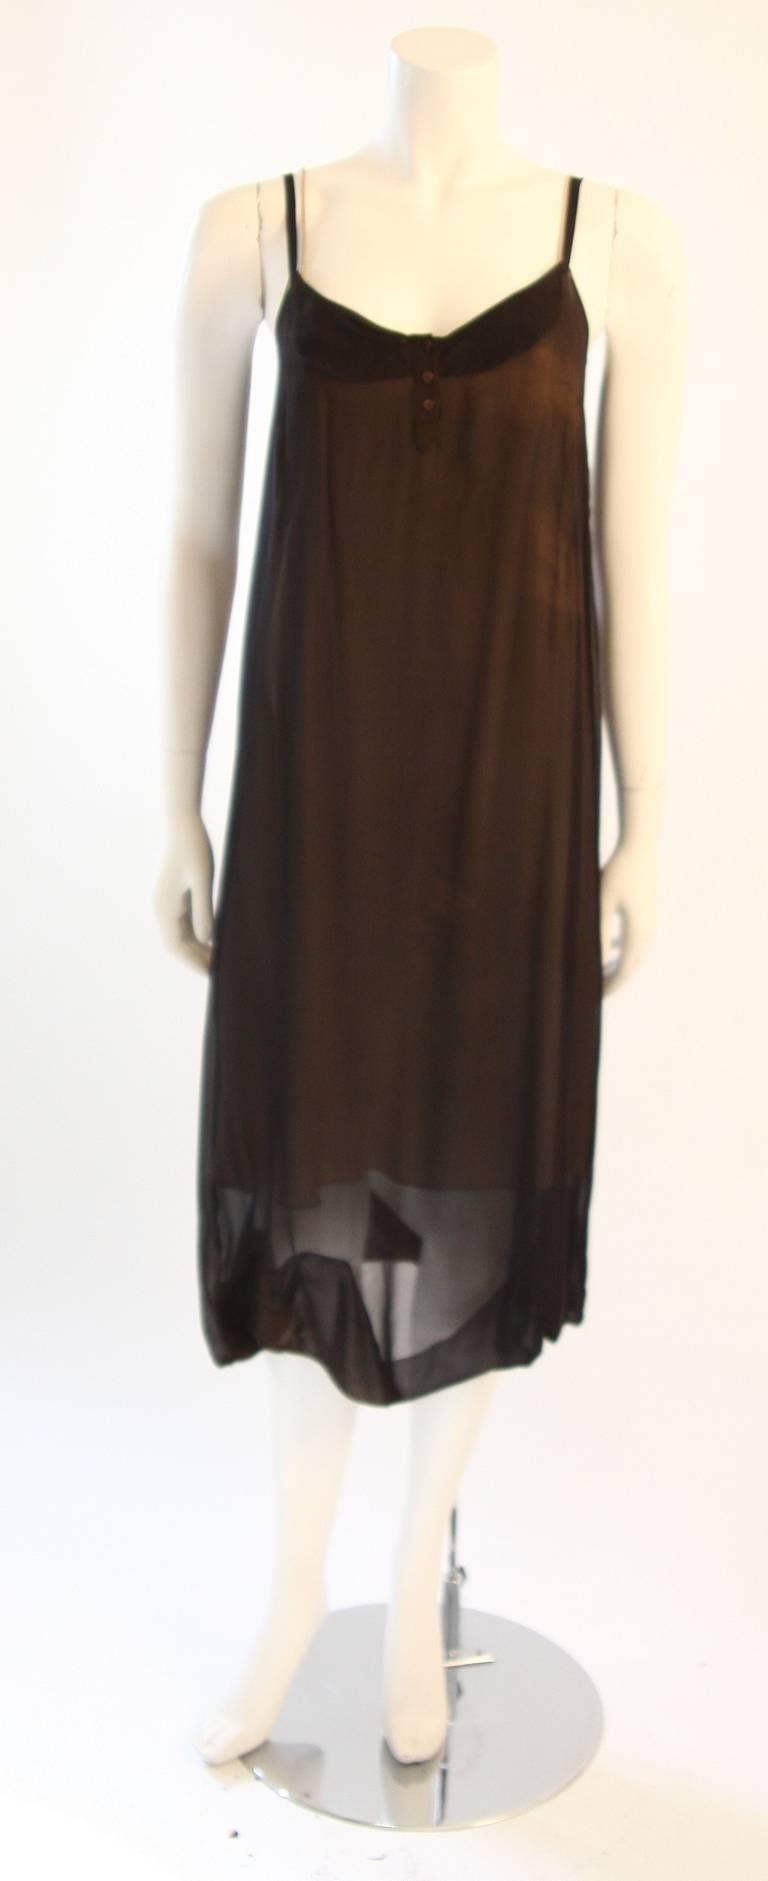 Chic Zac Posen Steam Punk Inspired Layered Black & Nude Silk Dress Ensemble For Sale 5